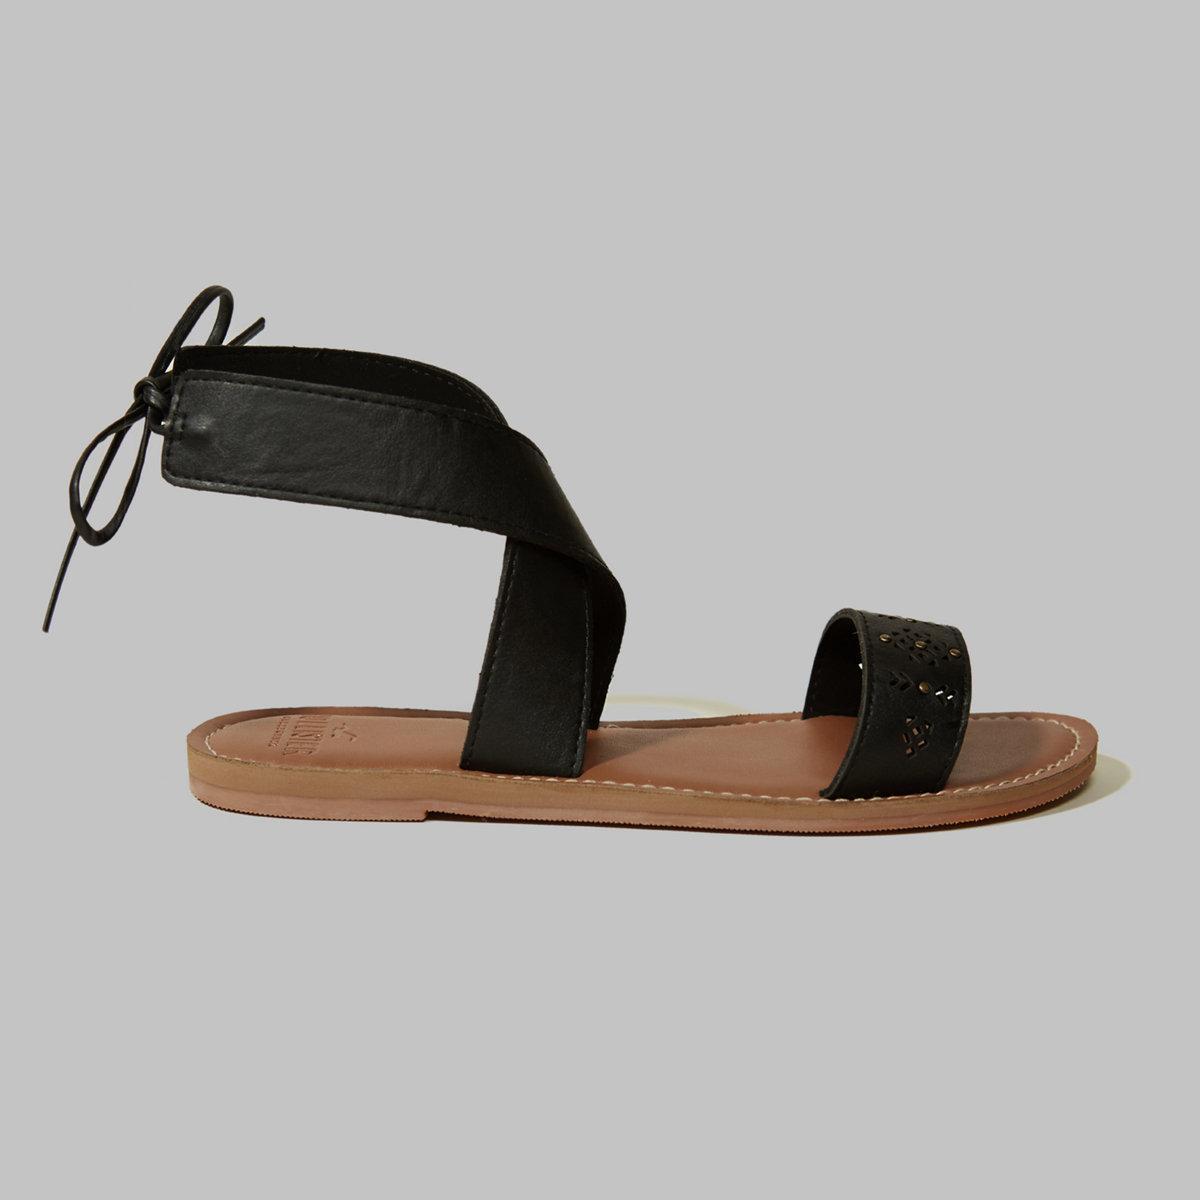 Studded Cross-Strap Sandals